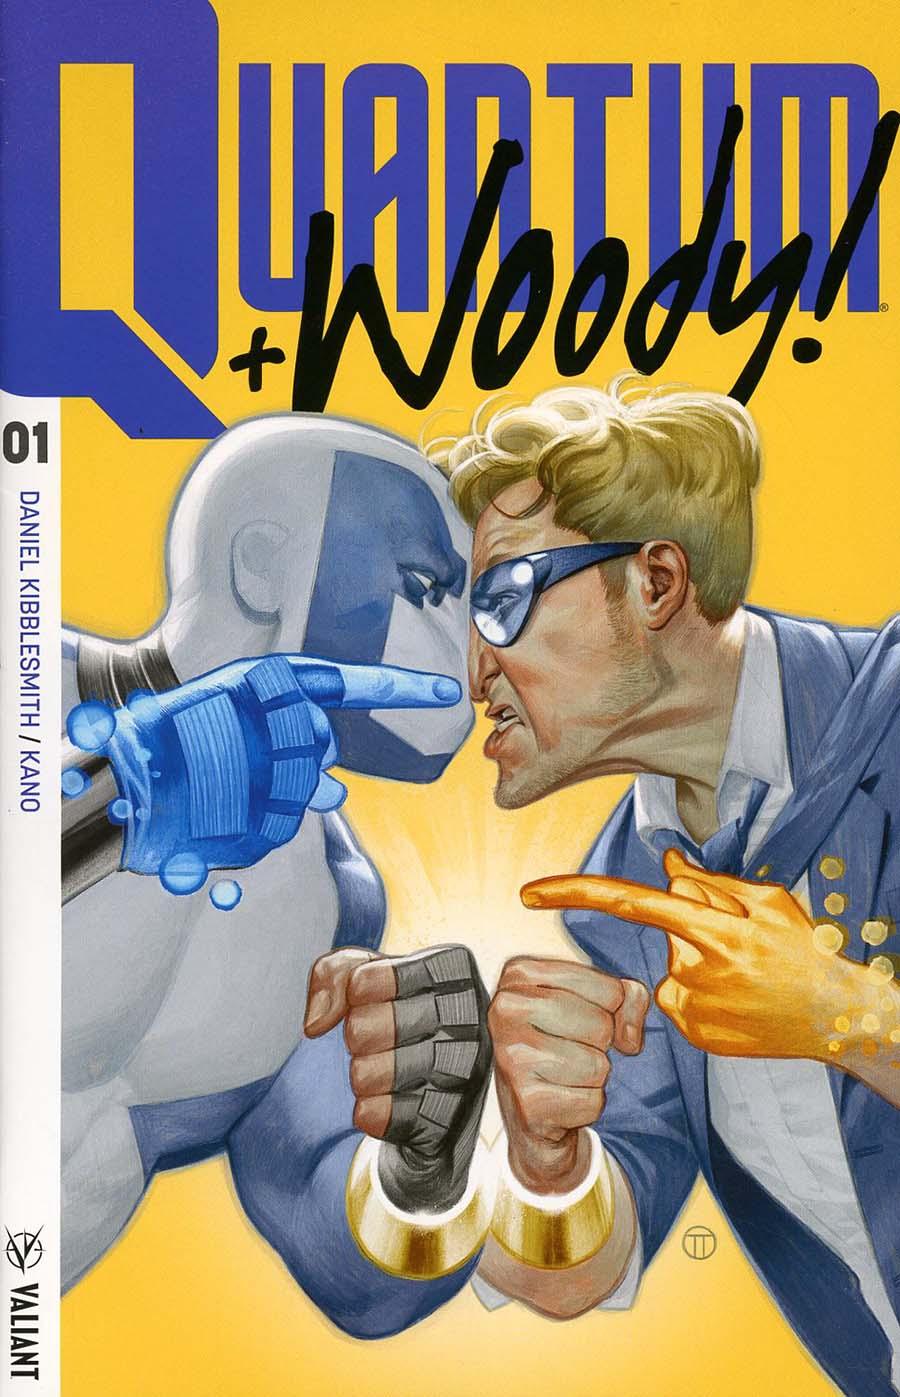 Quantum & Woody Vol 4 #1 Cover G 3rd Ptg Variant Julian Totino Tedesco Cover